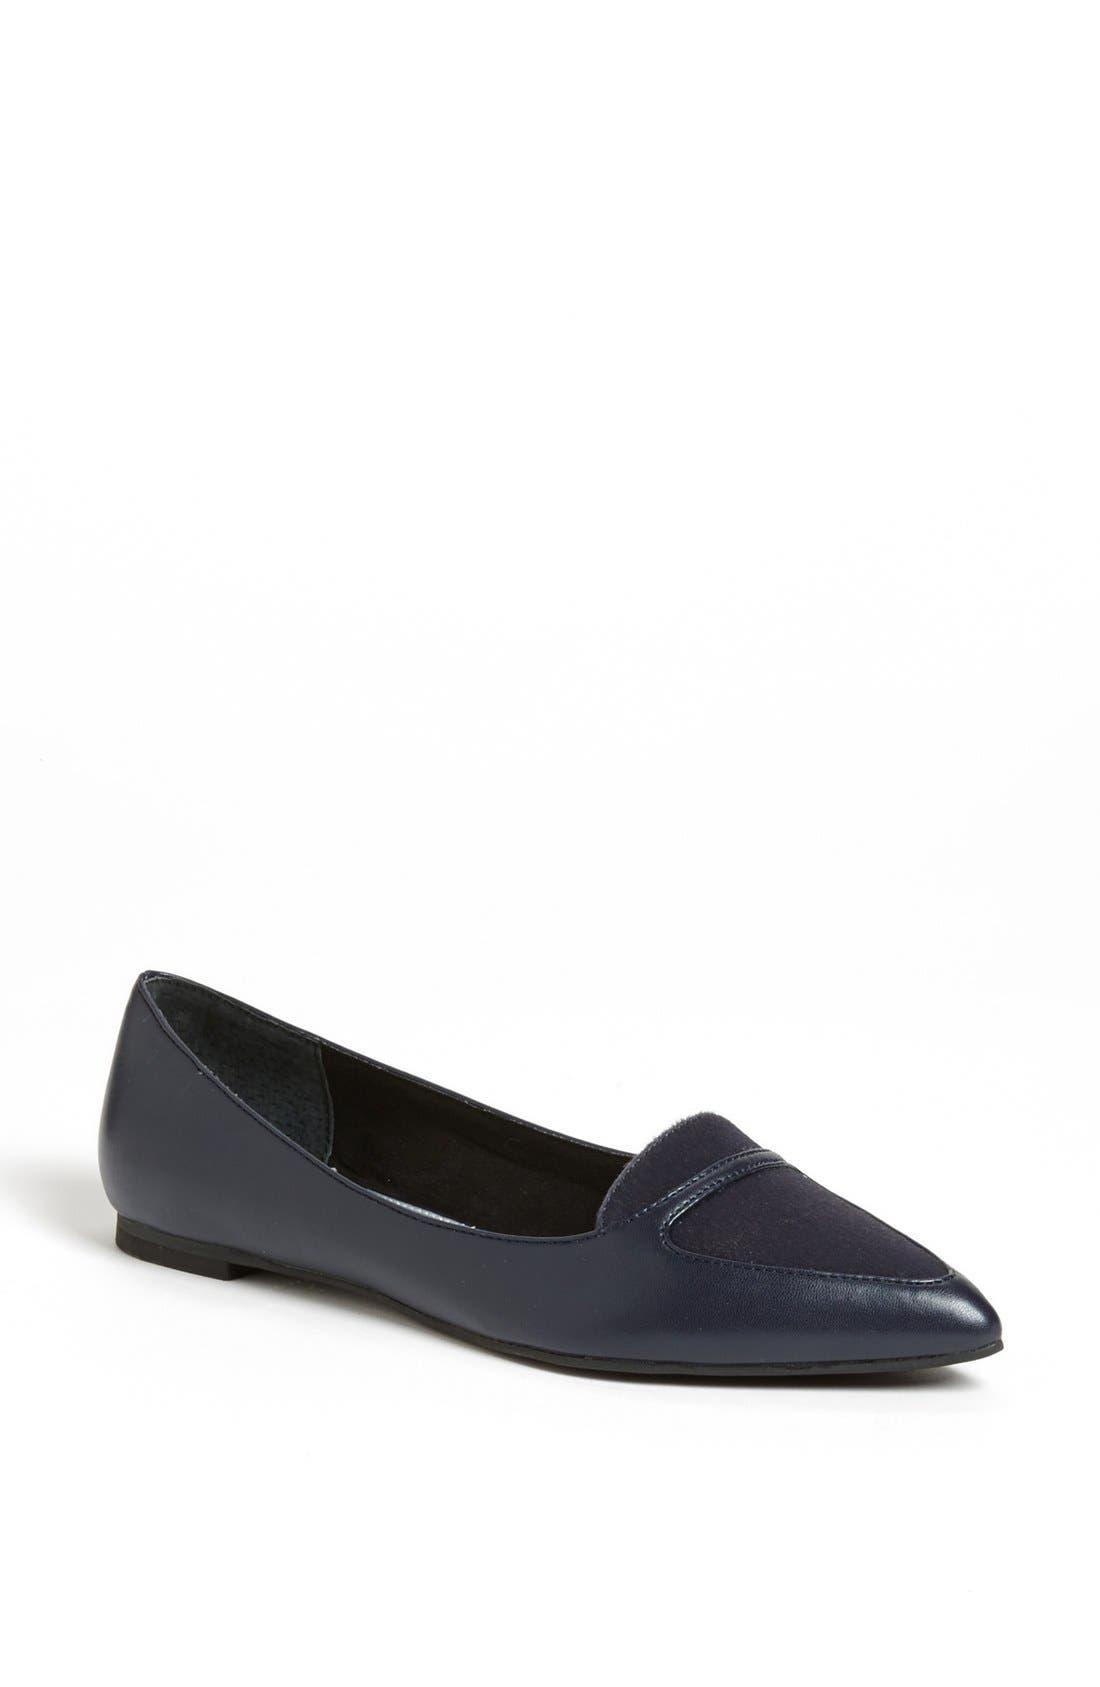 Alternate Image 1 Selected - Tildon 'Naples' Pointy Toe Flat